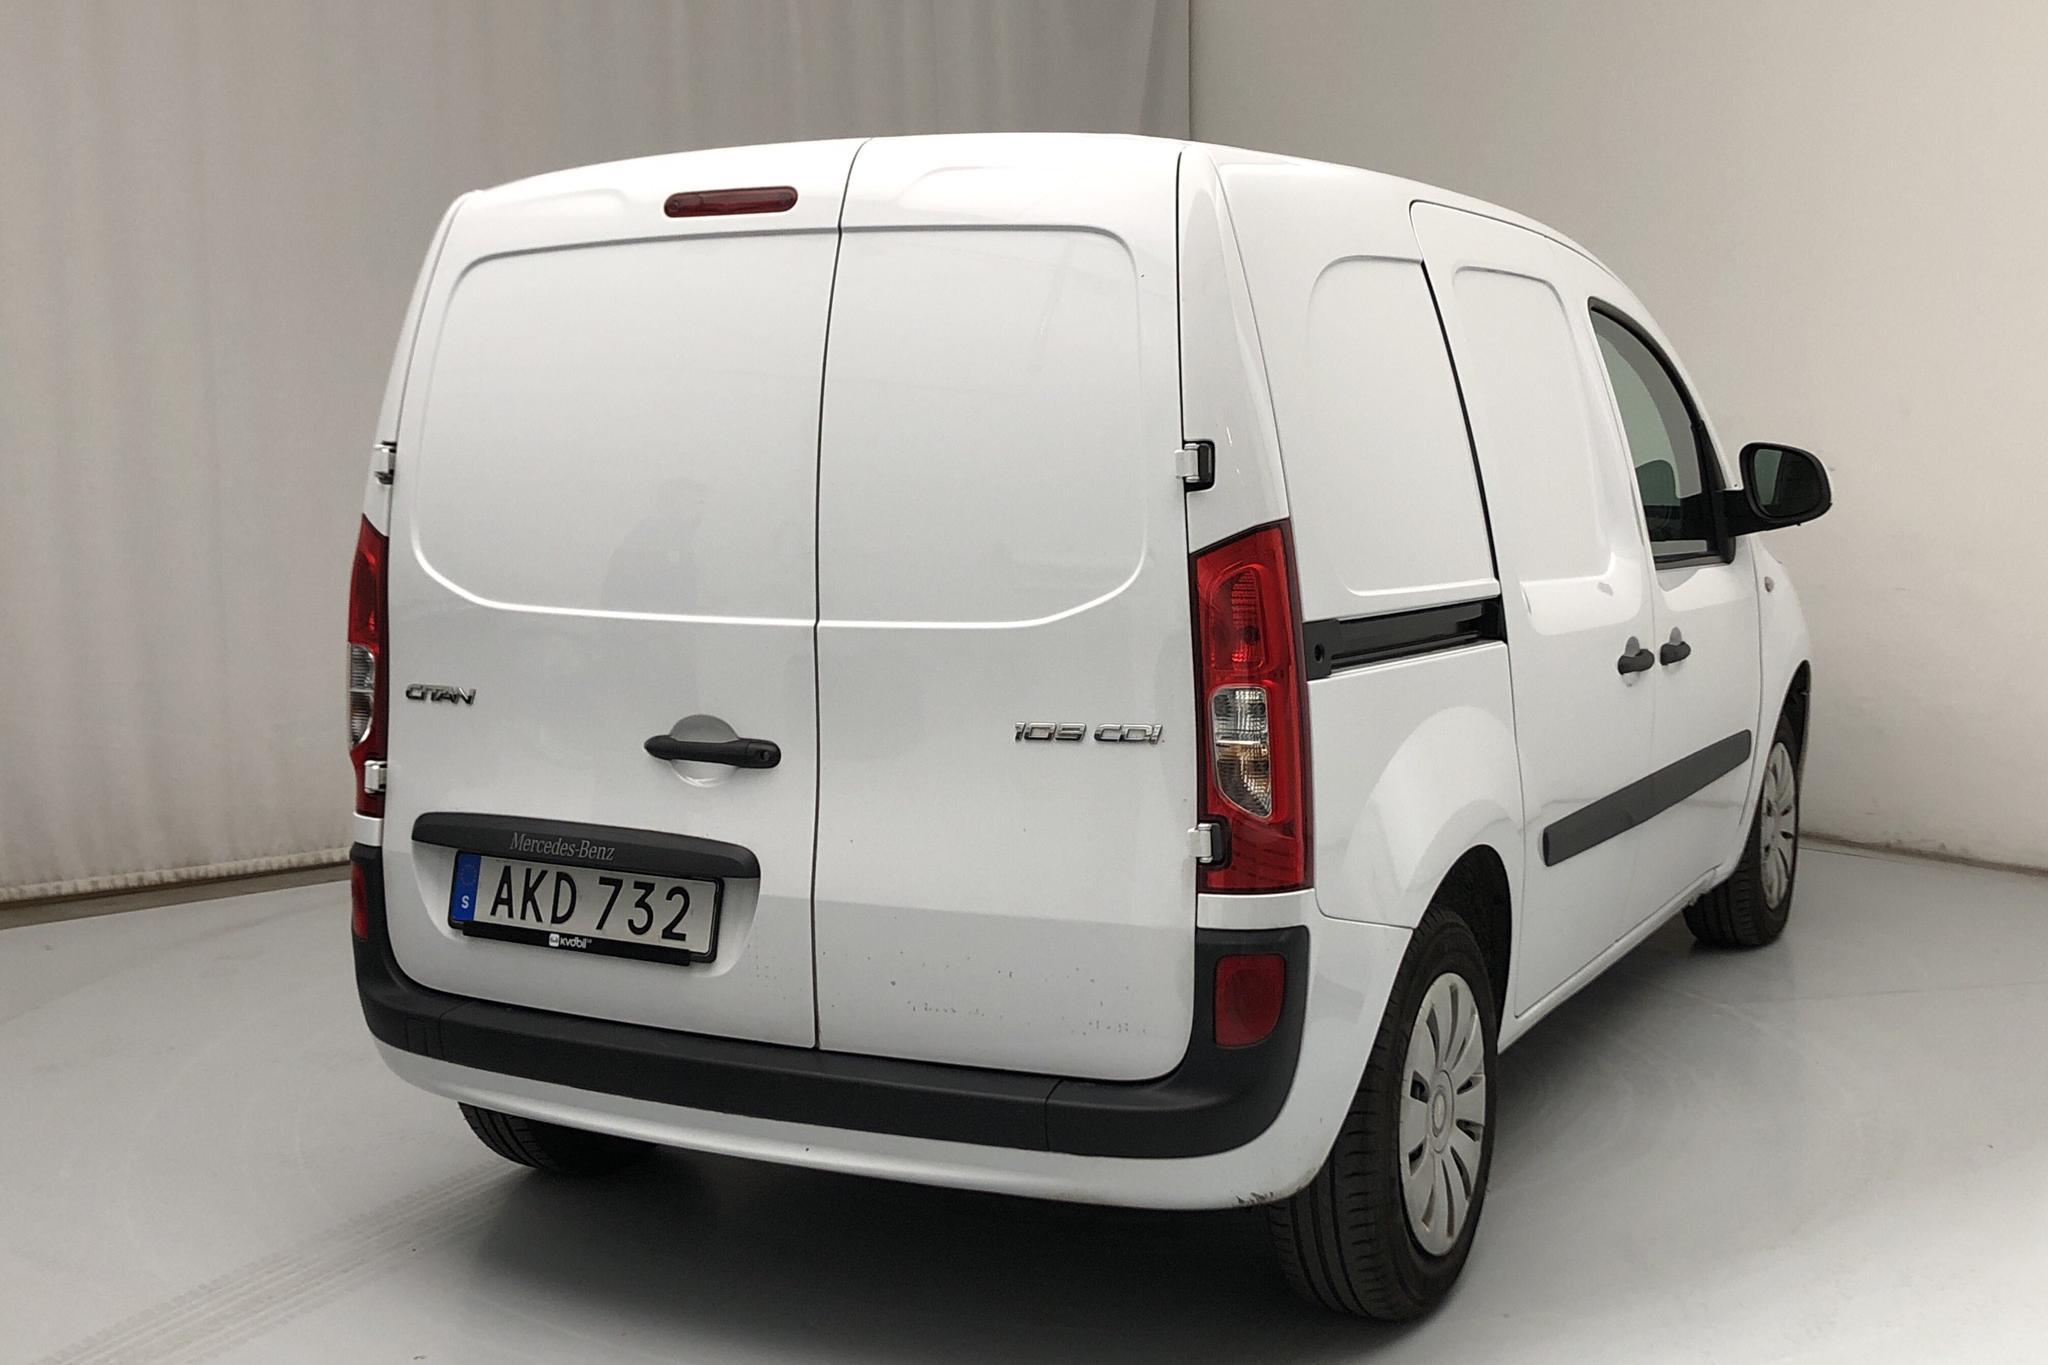 Mercedes Citan 109 1.5 CDI (90hk) - 4 303 mil - Manuell - vit - 2019